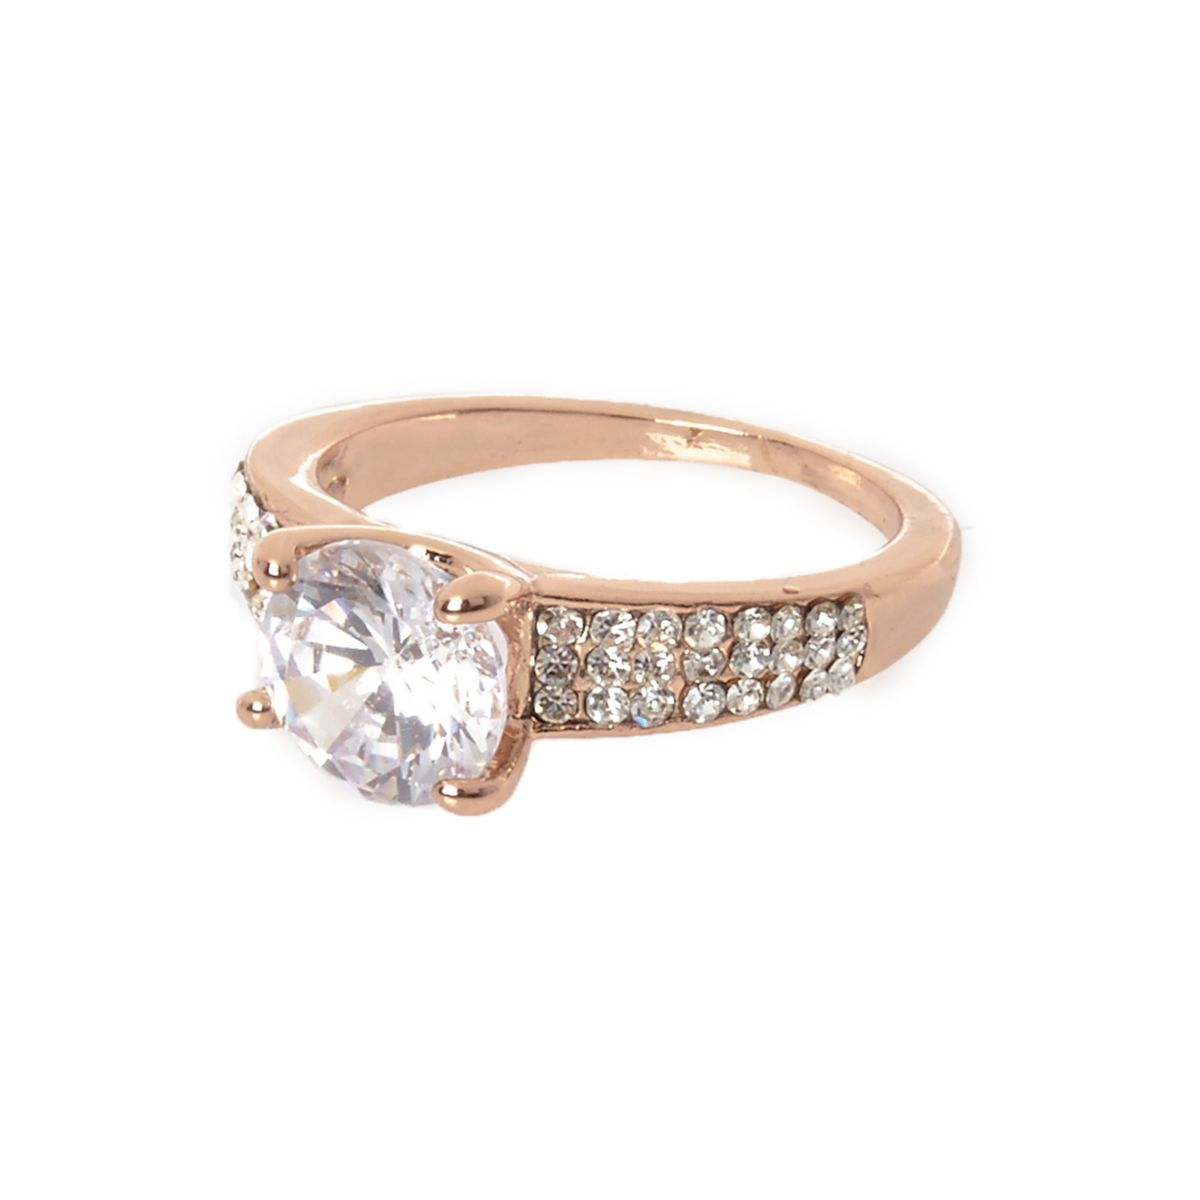 Roségoudkleurige ring met zirkonia